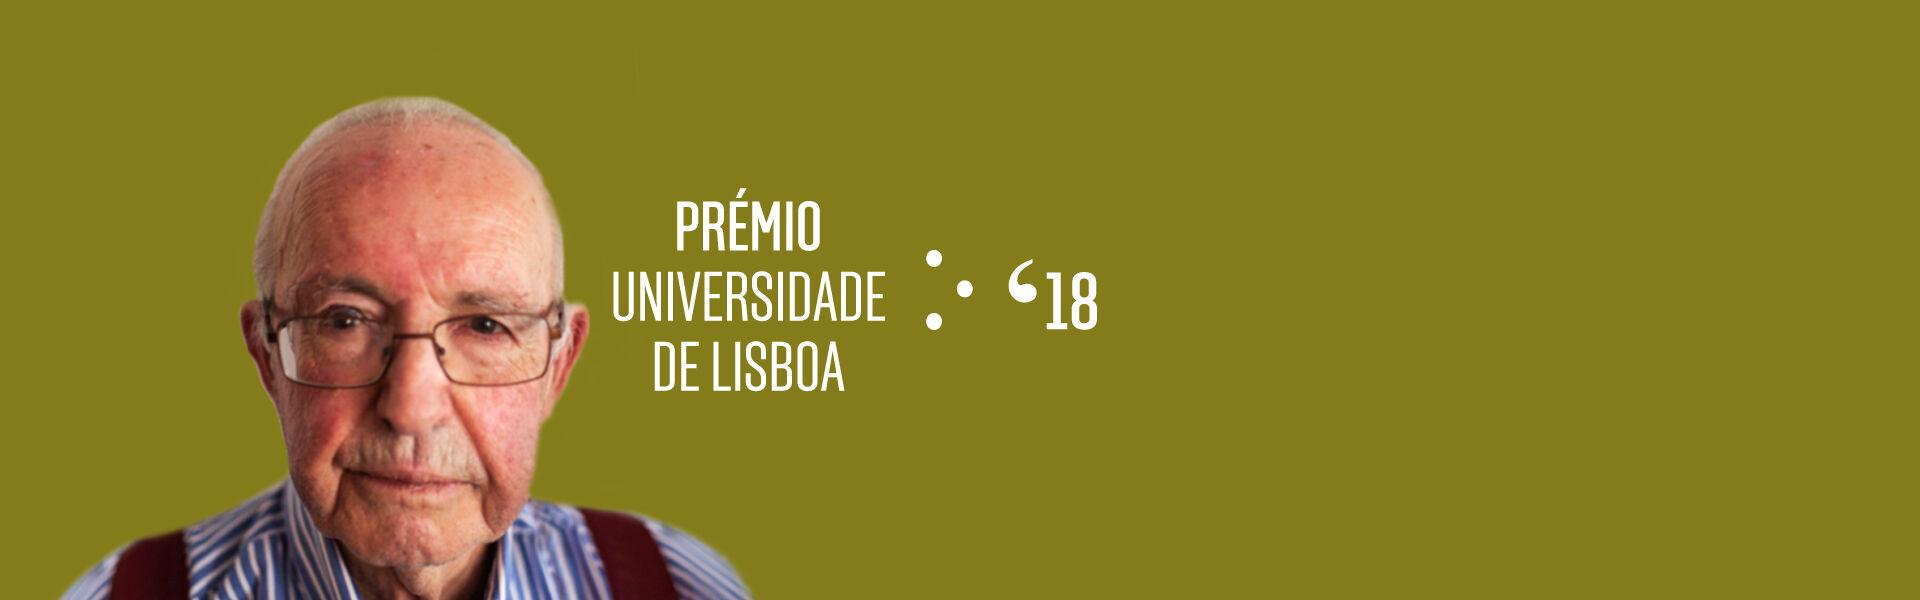 Prémio Universidade de Lisboa 2018